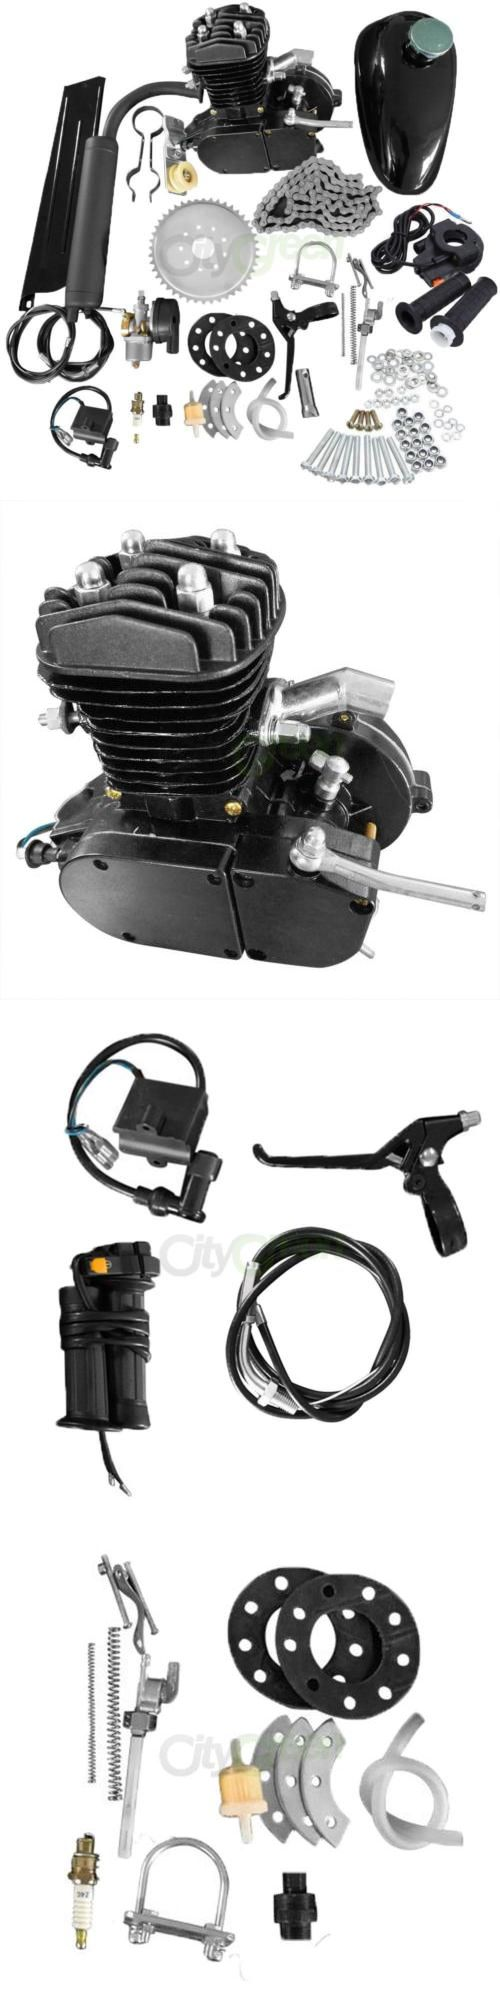 motorcycle parts: 80Cc Bike Bicycle Motorized 2 Stroke Petrol Gas Motor Engine Kit Set Black -> BUY IT NOW ONLY: $95.97 on eBay!